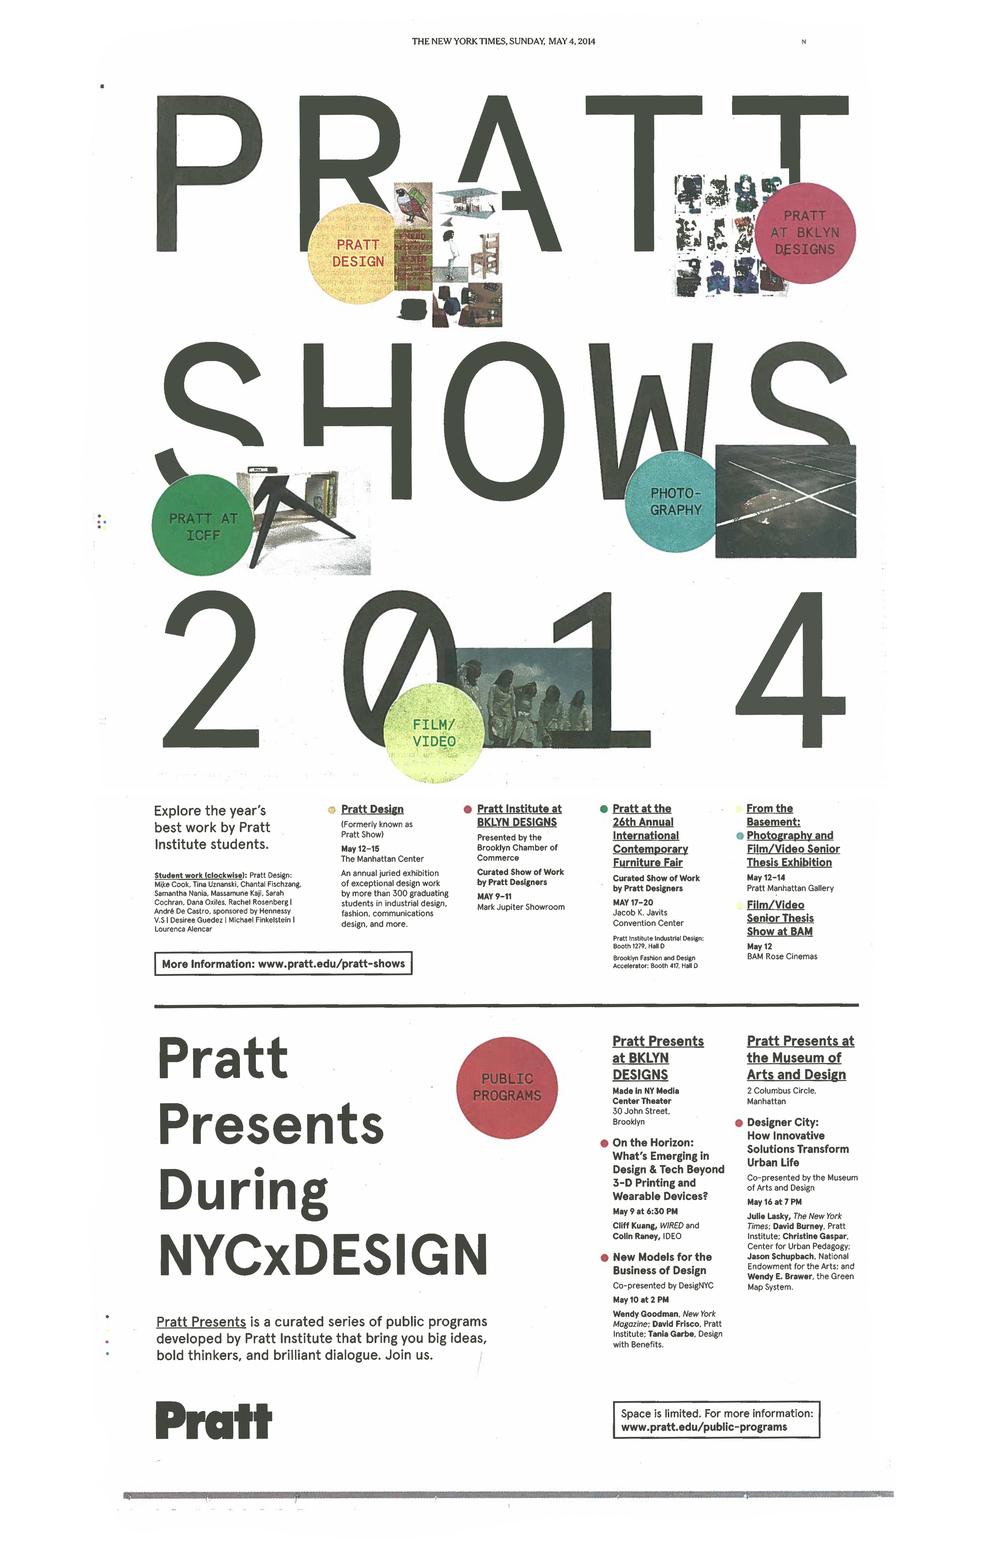 NewYorkTimes_Pratt_show(1).jpg